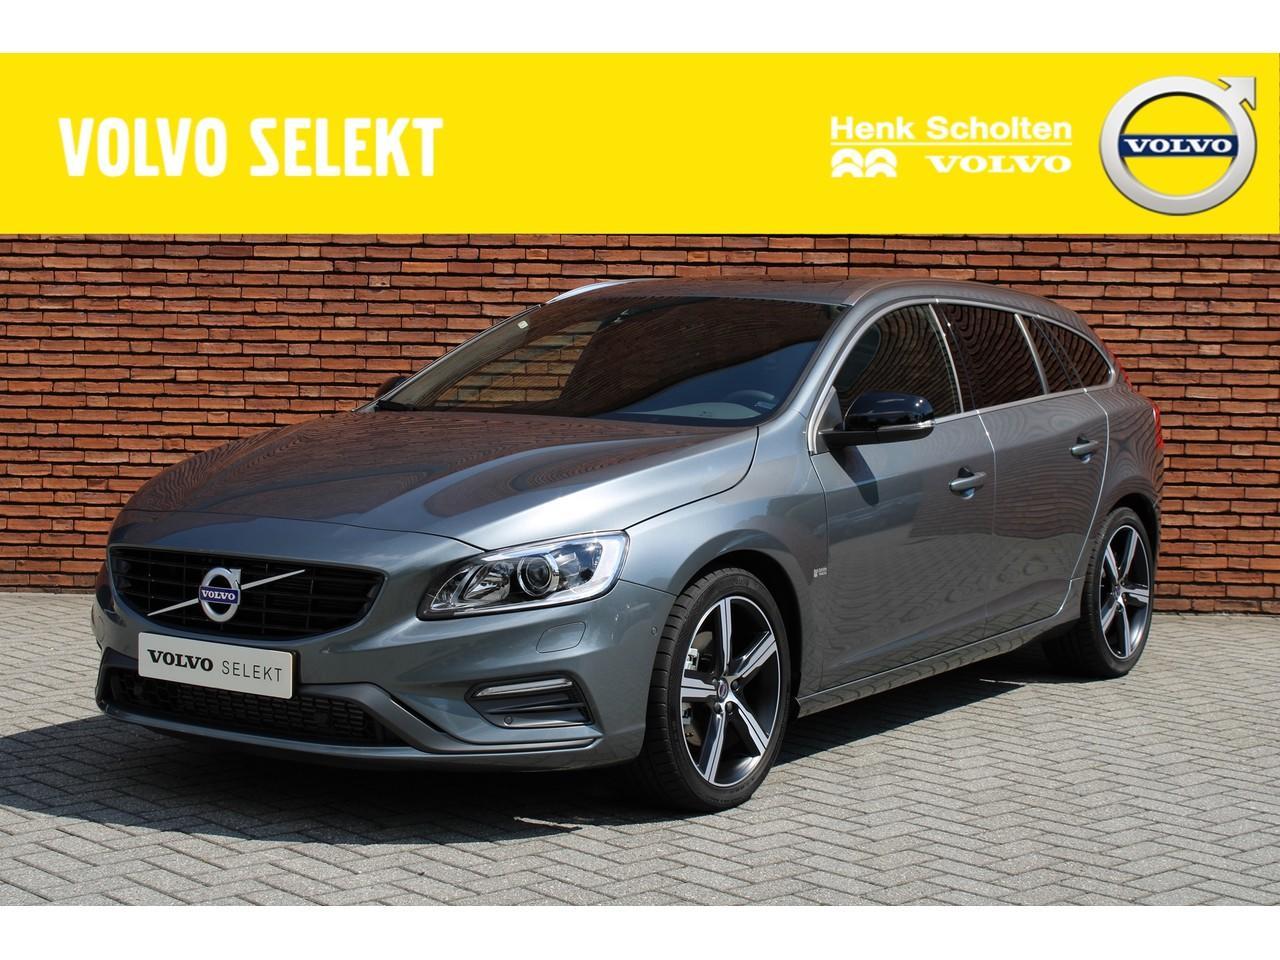 Volvo V60 D4 190pk geartronic business sport luxury scan.